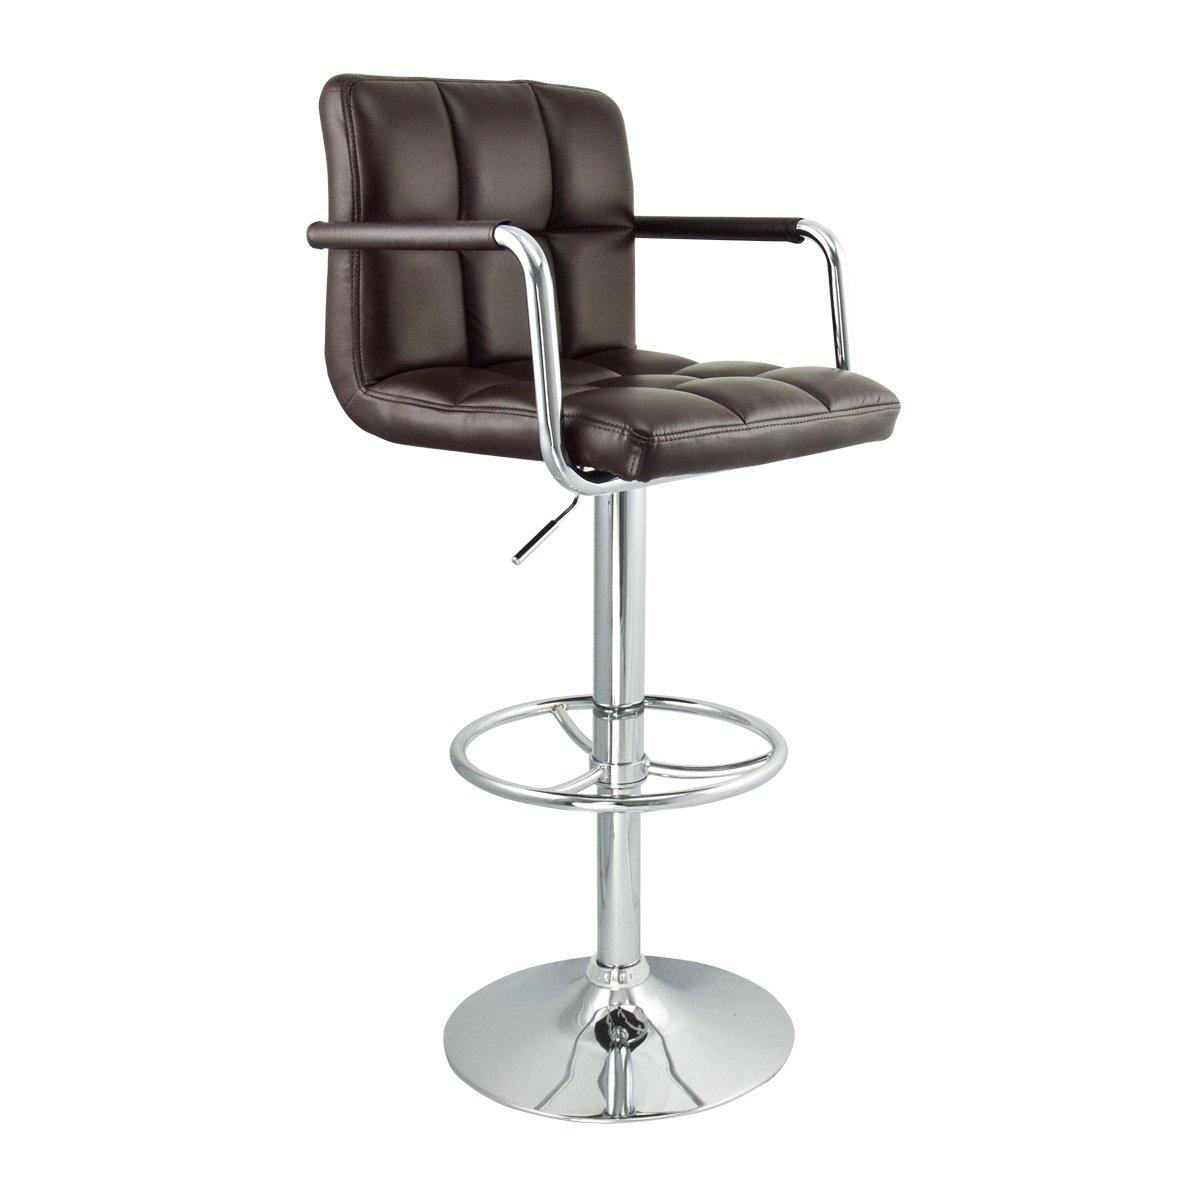 Roundhill Pc140r 2 Swivel Elegant Pu Leather Modern